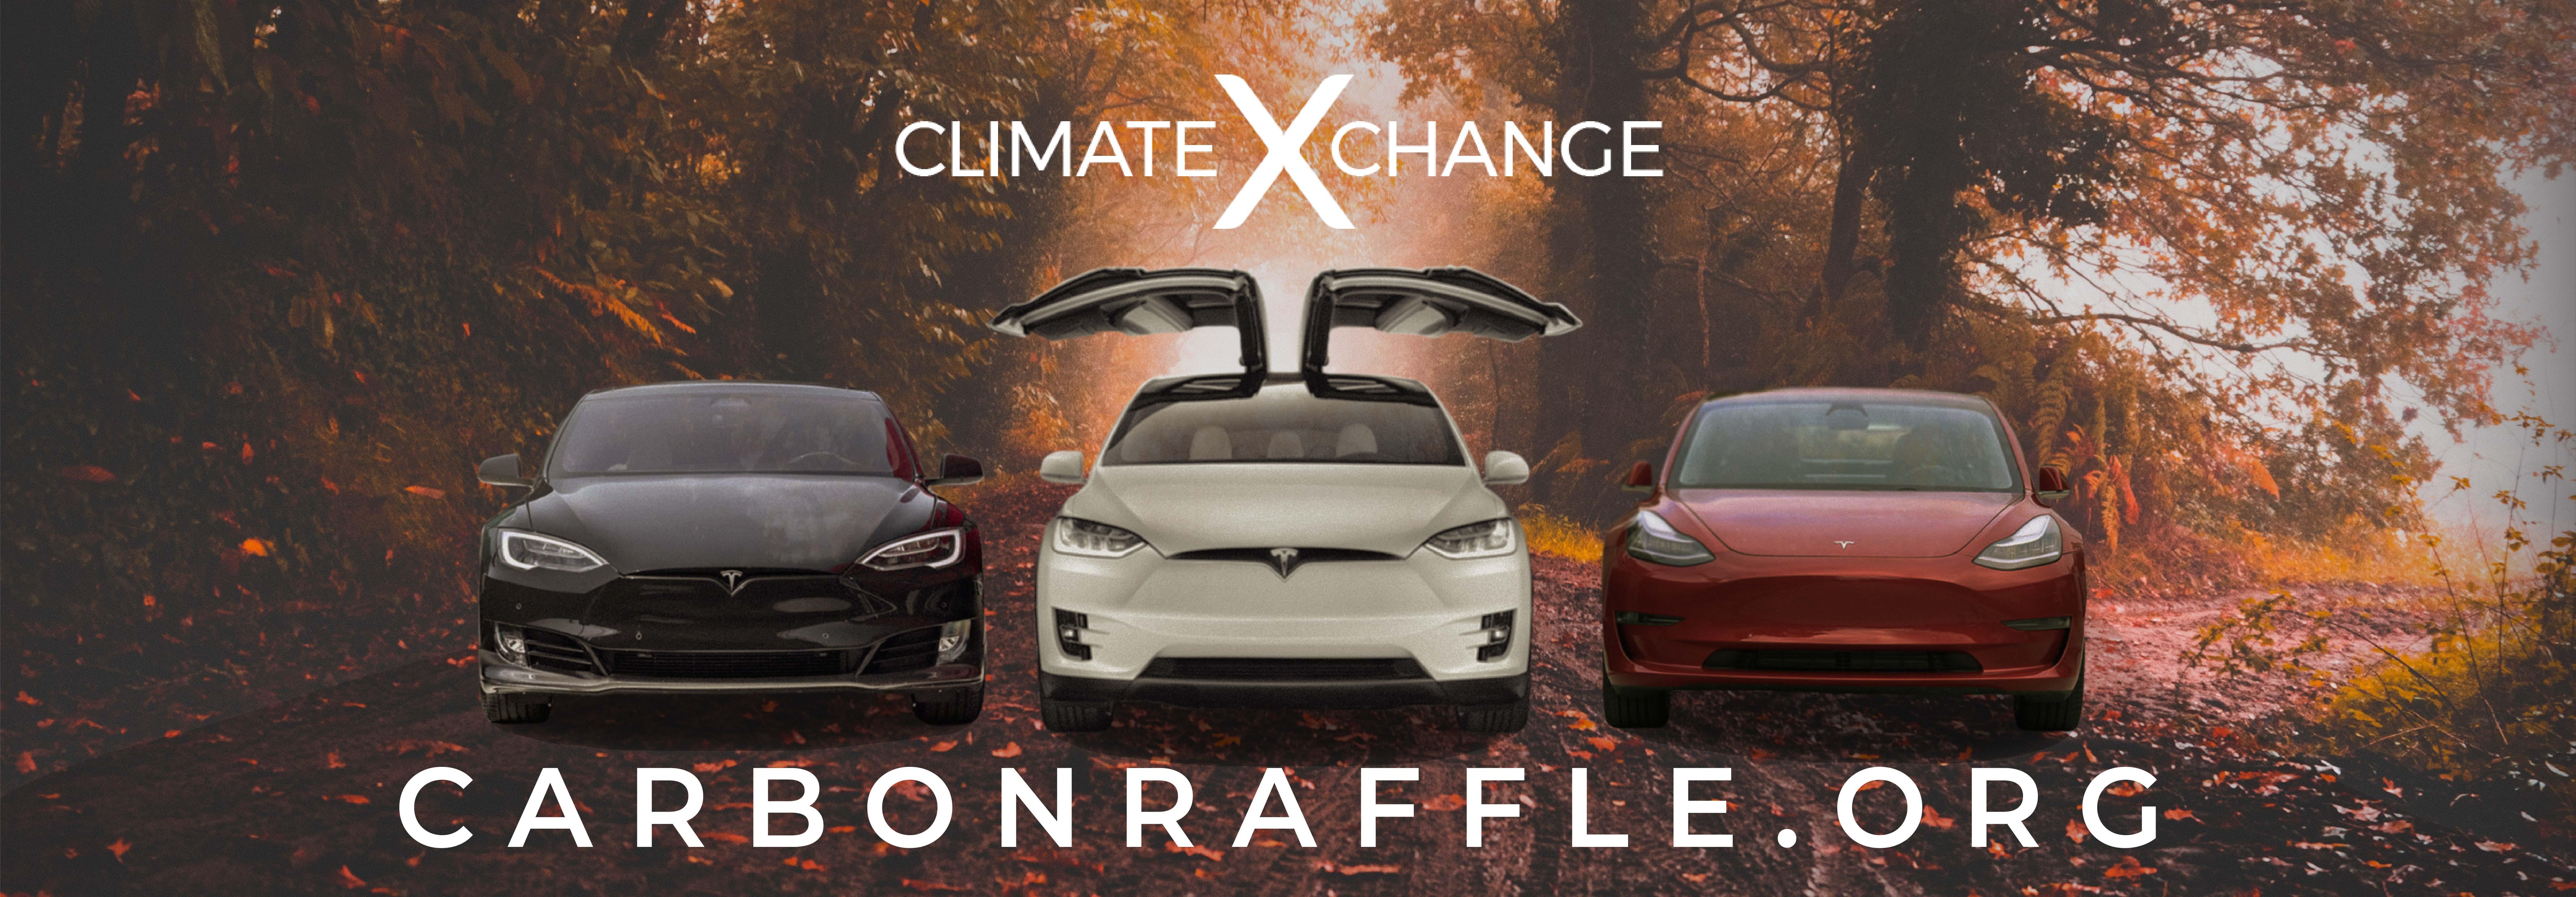 Autumnal 3 Teslas Banner Ad 10.17.2018